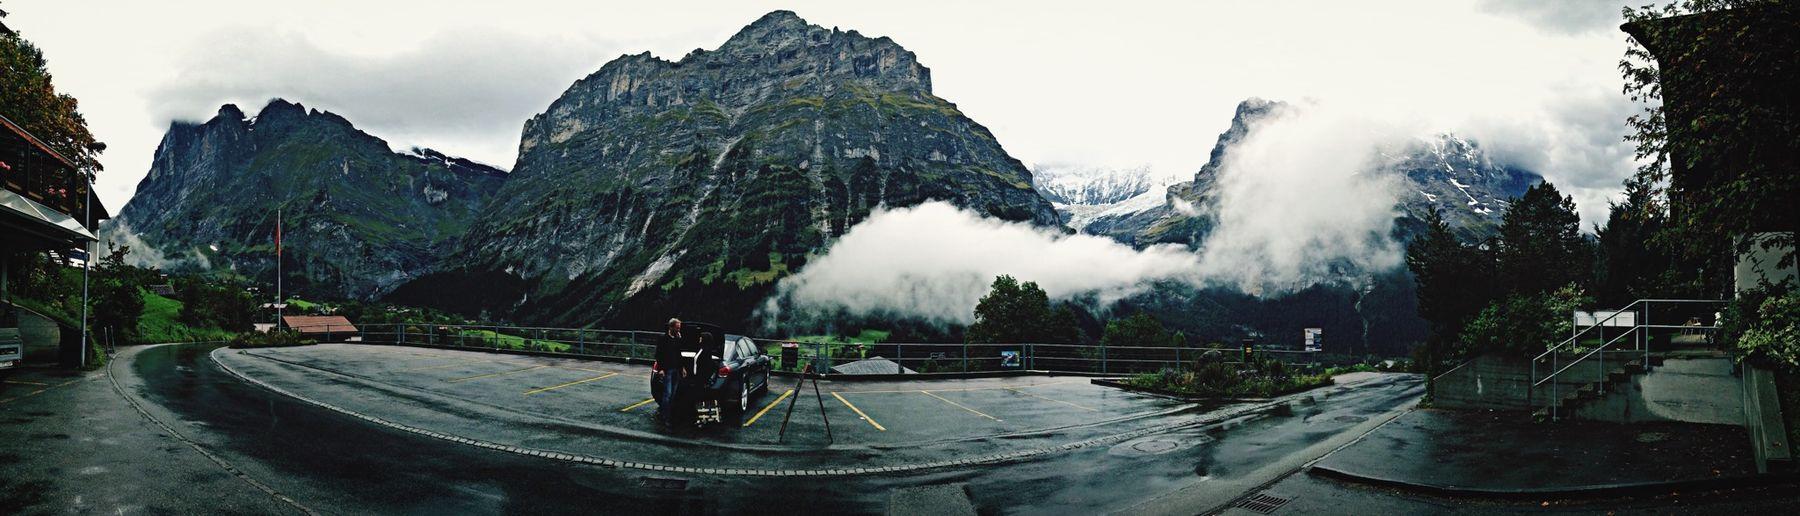 Mountains Switzerland Awsame